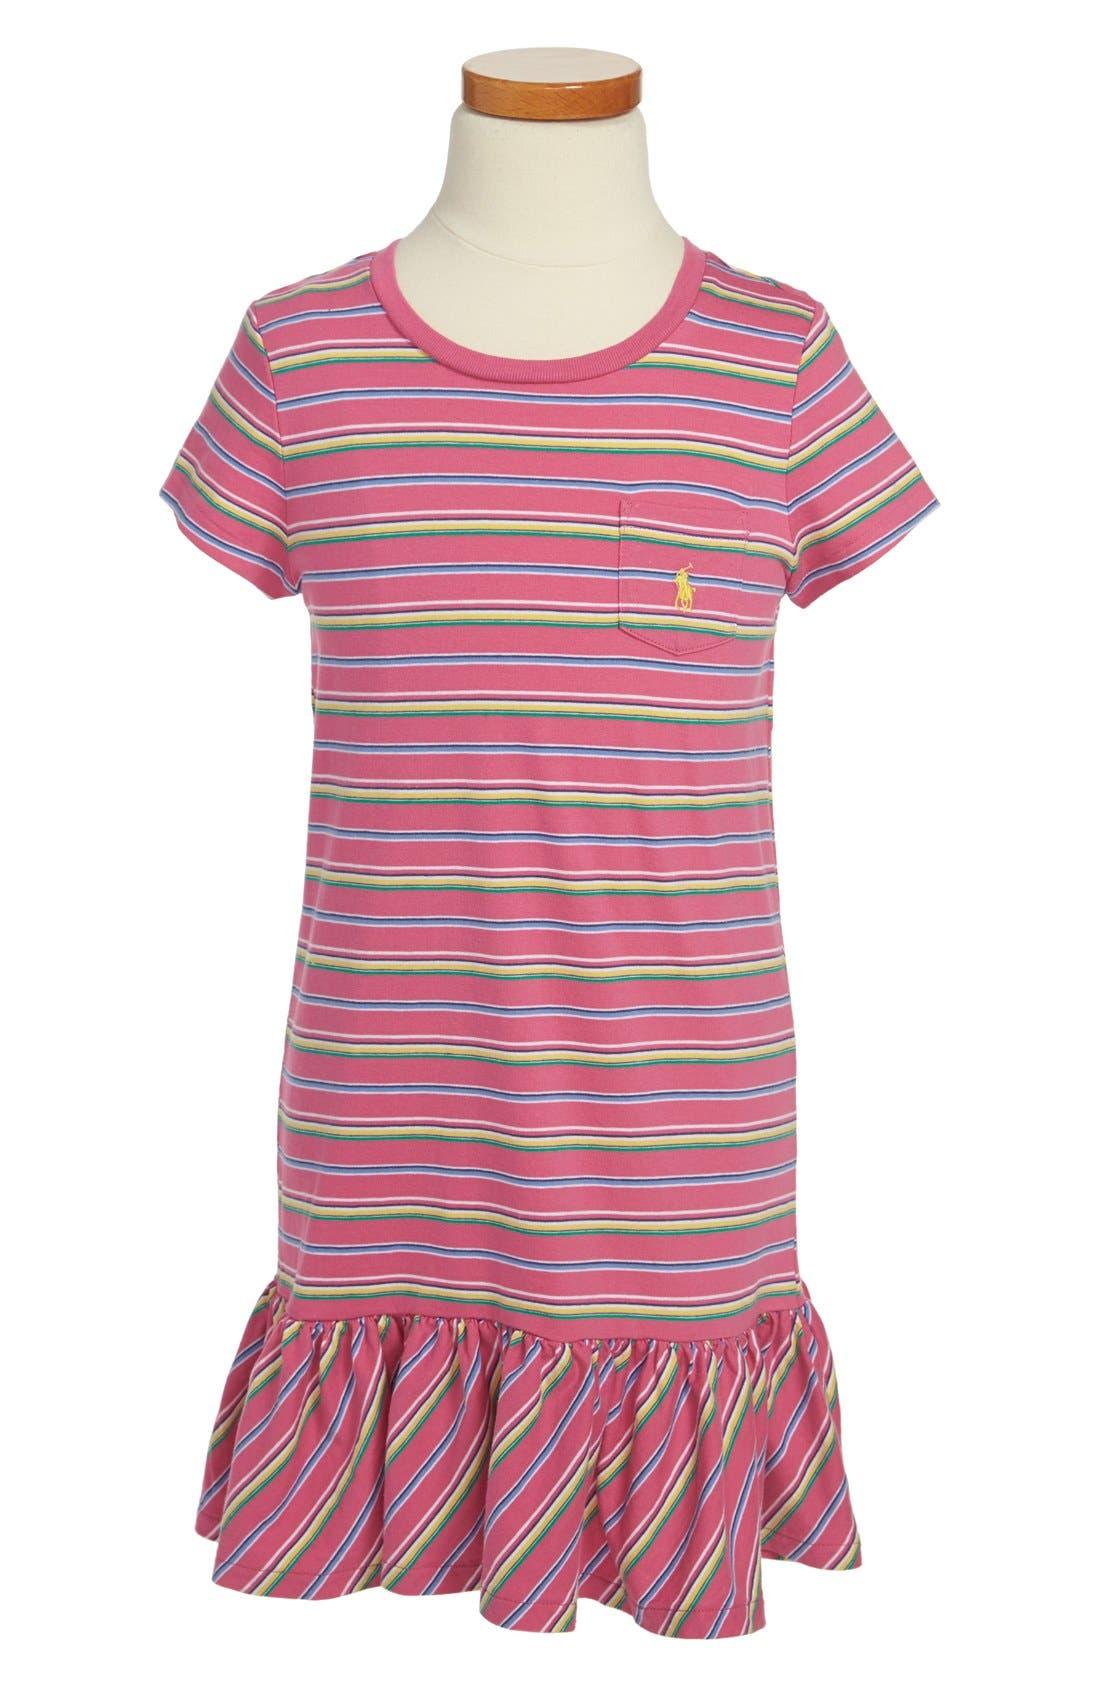 Alternate Image 1 Selected - Ralph Lauren Stripe T-Shirt Dress (Little Girls)